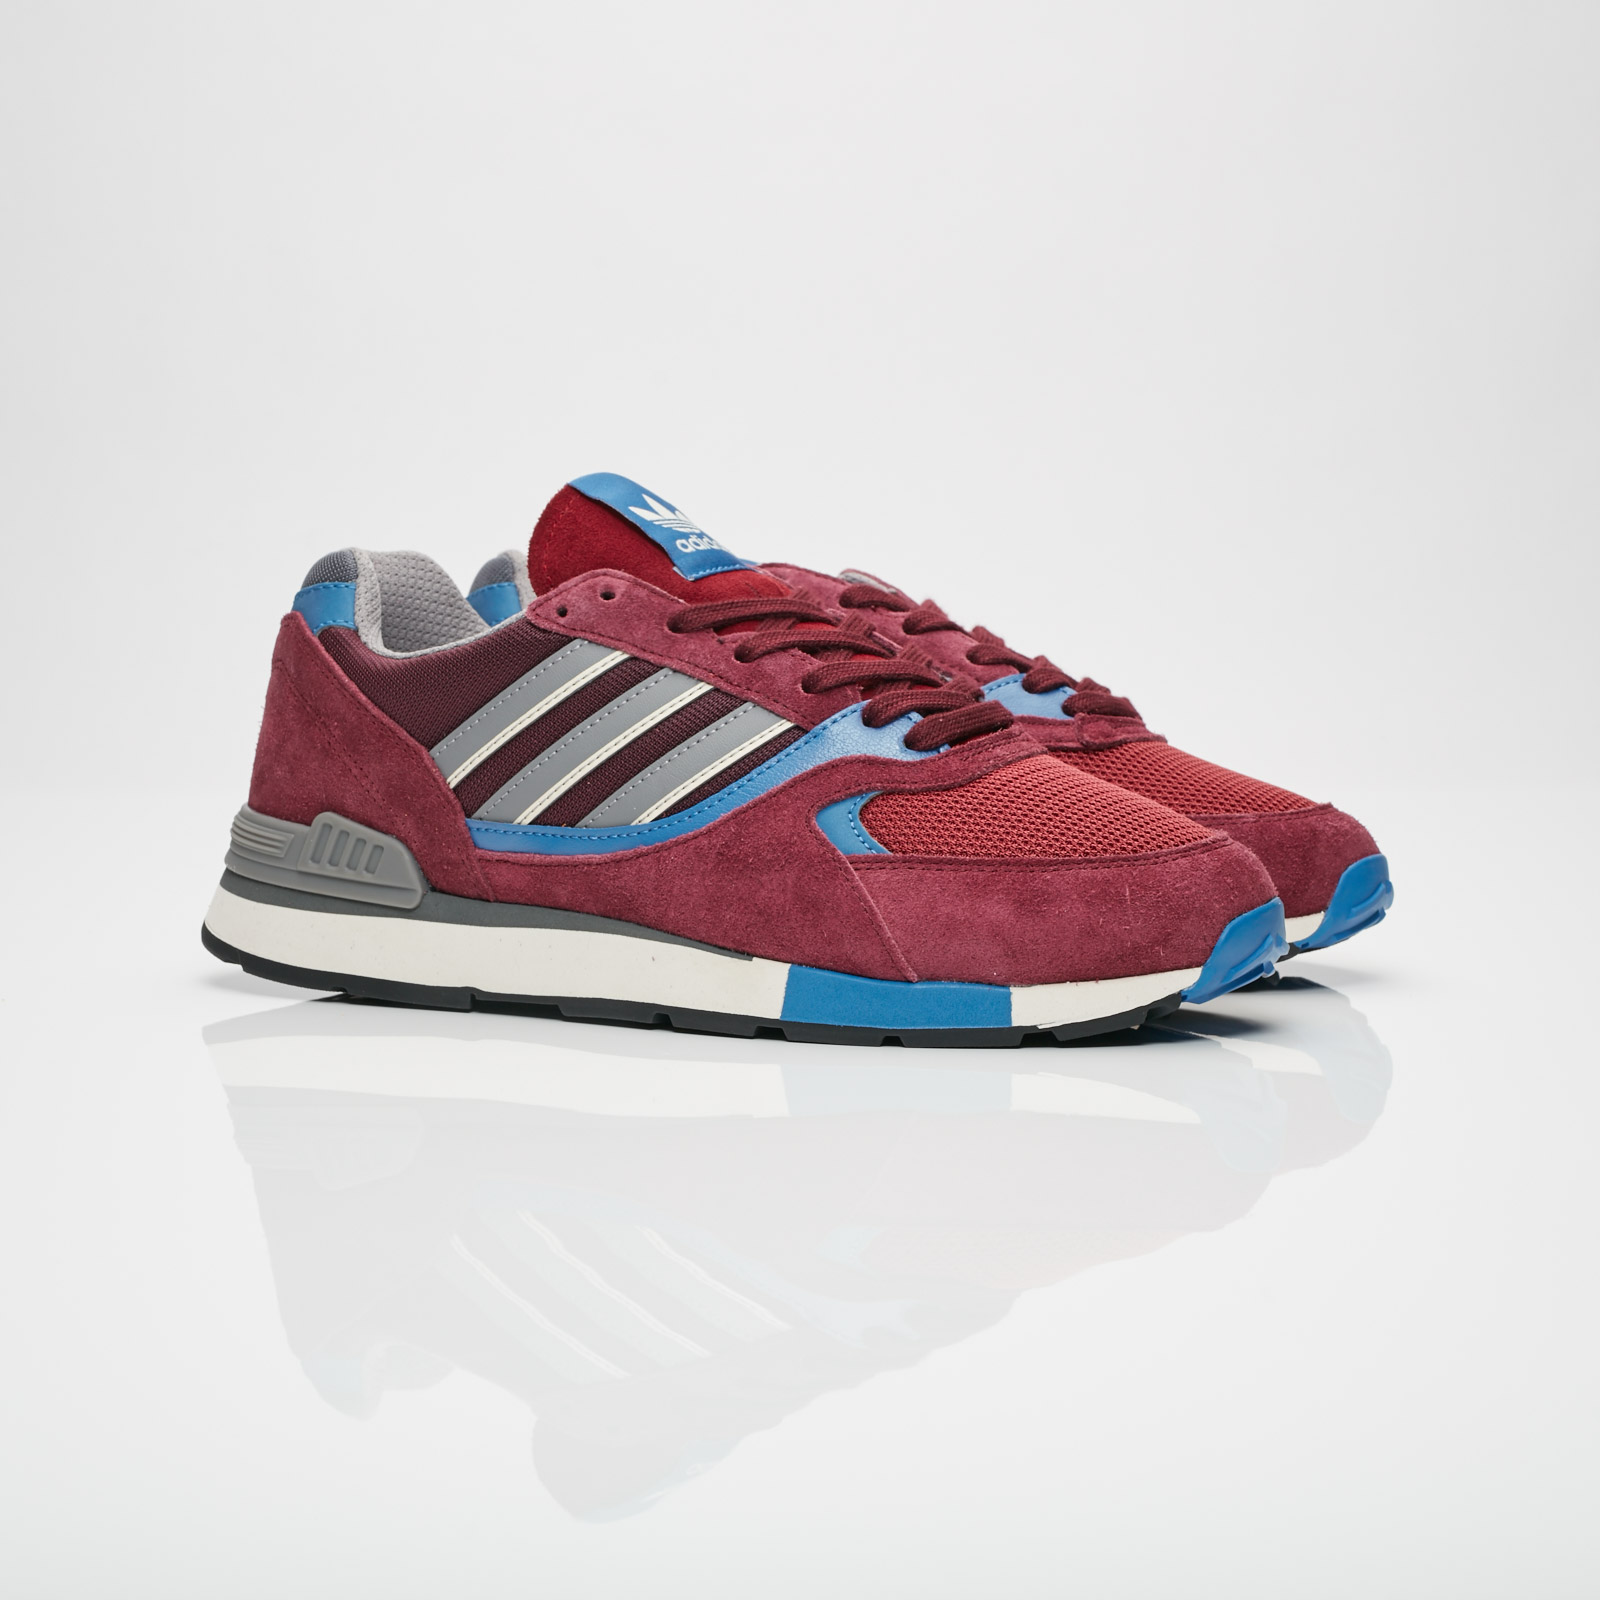 ef4b1da411c71d adidas Quesence - Cq2132 - Sneakersnstuff